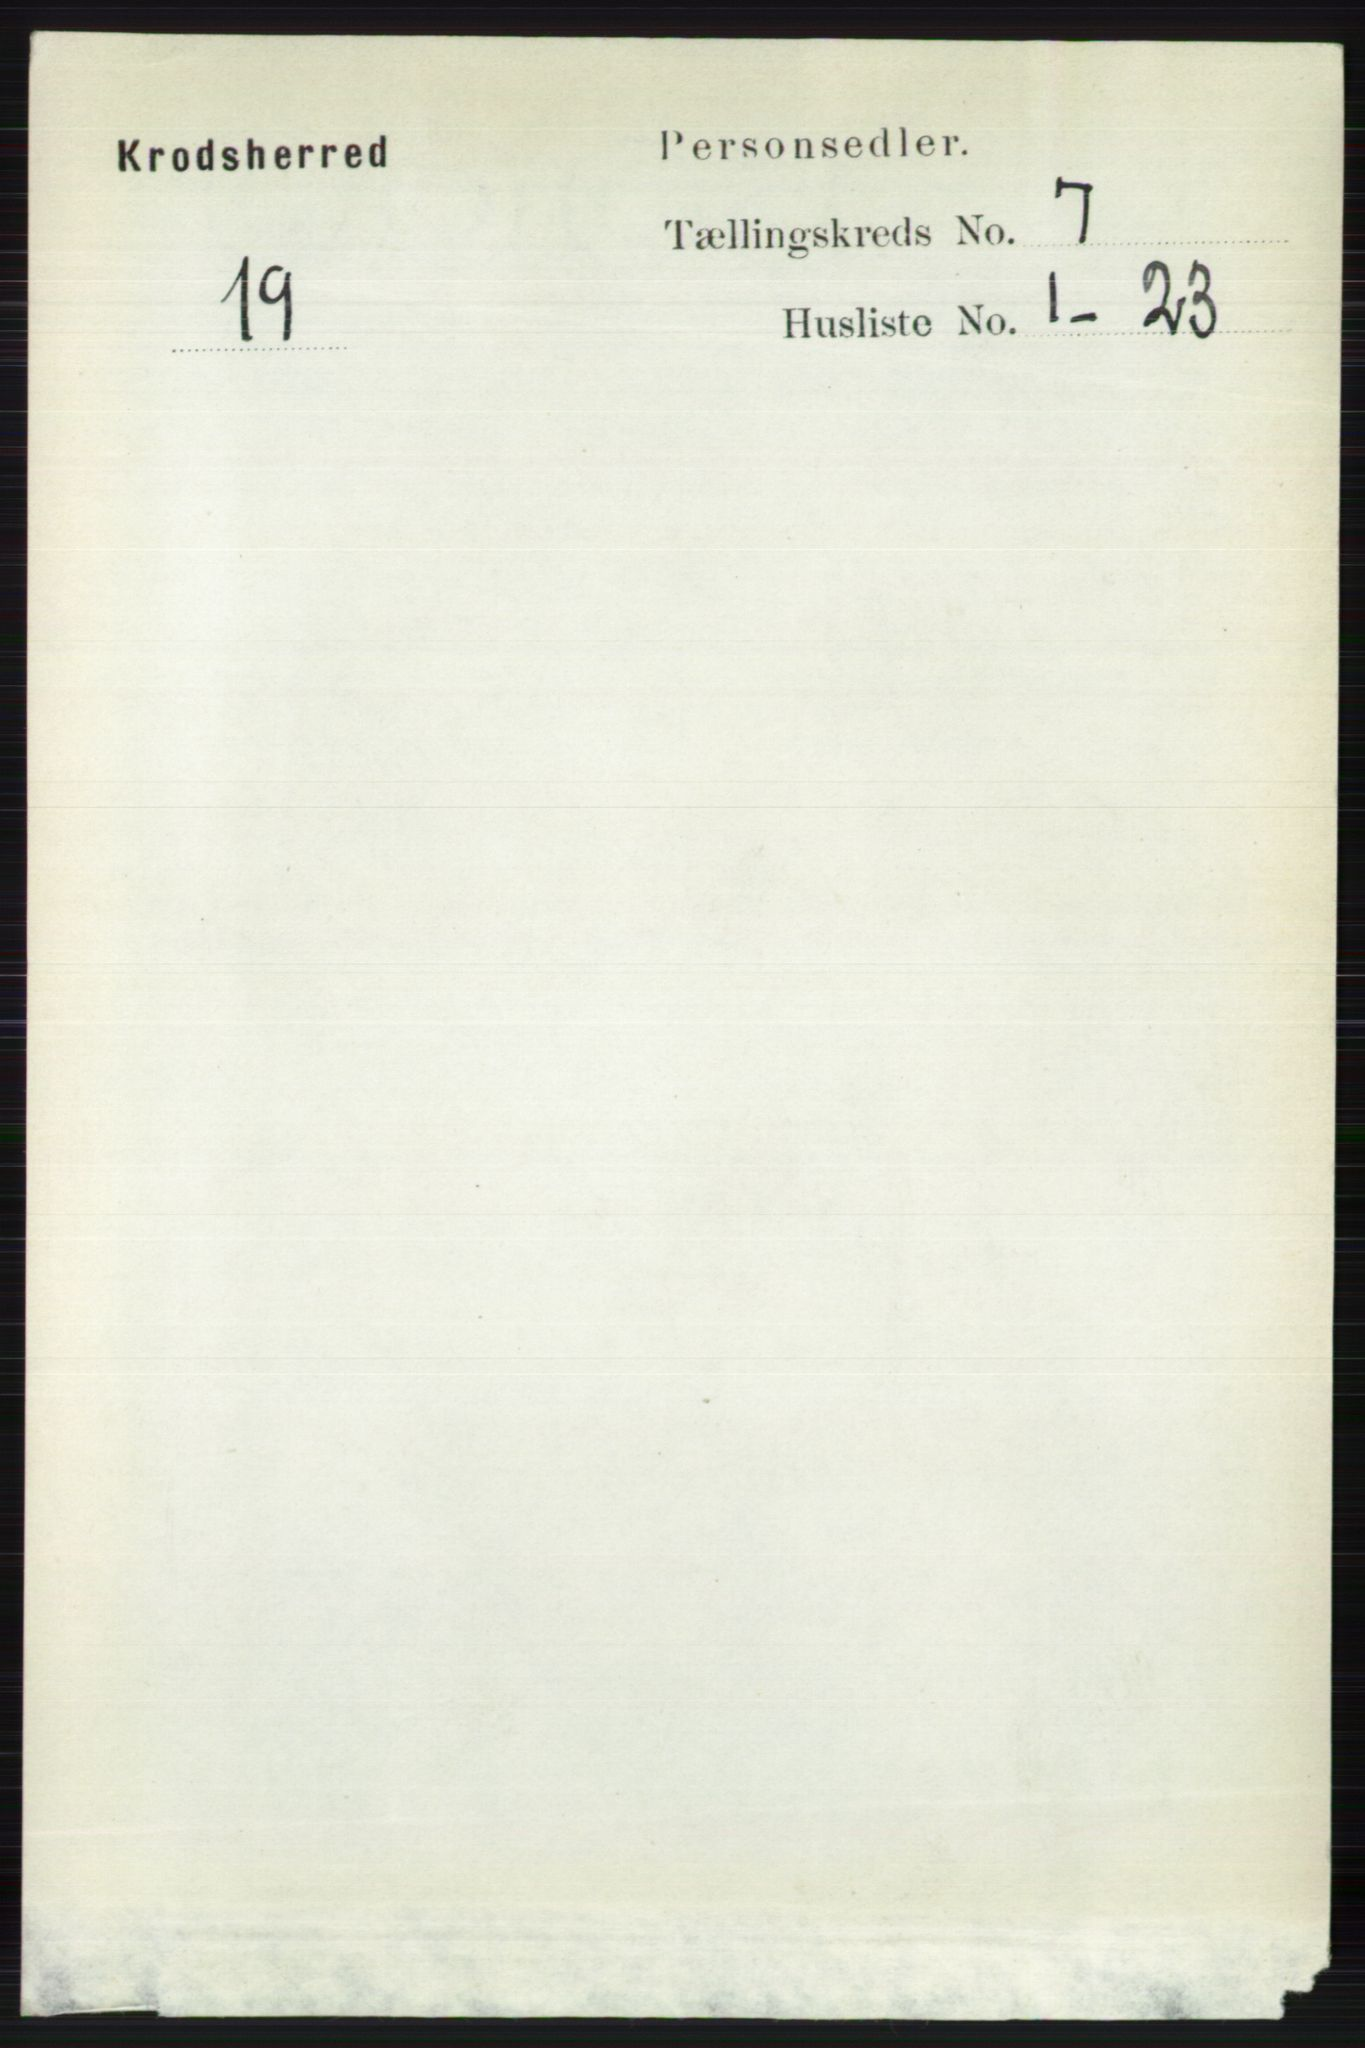 RA, Folketelling 1891 for 0621 Sigdal herred, 1891, s. 7022